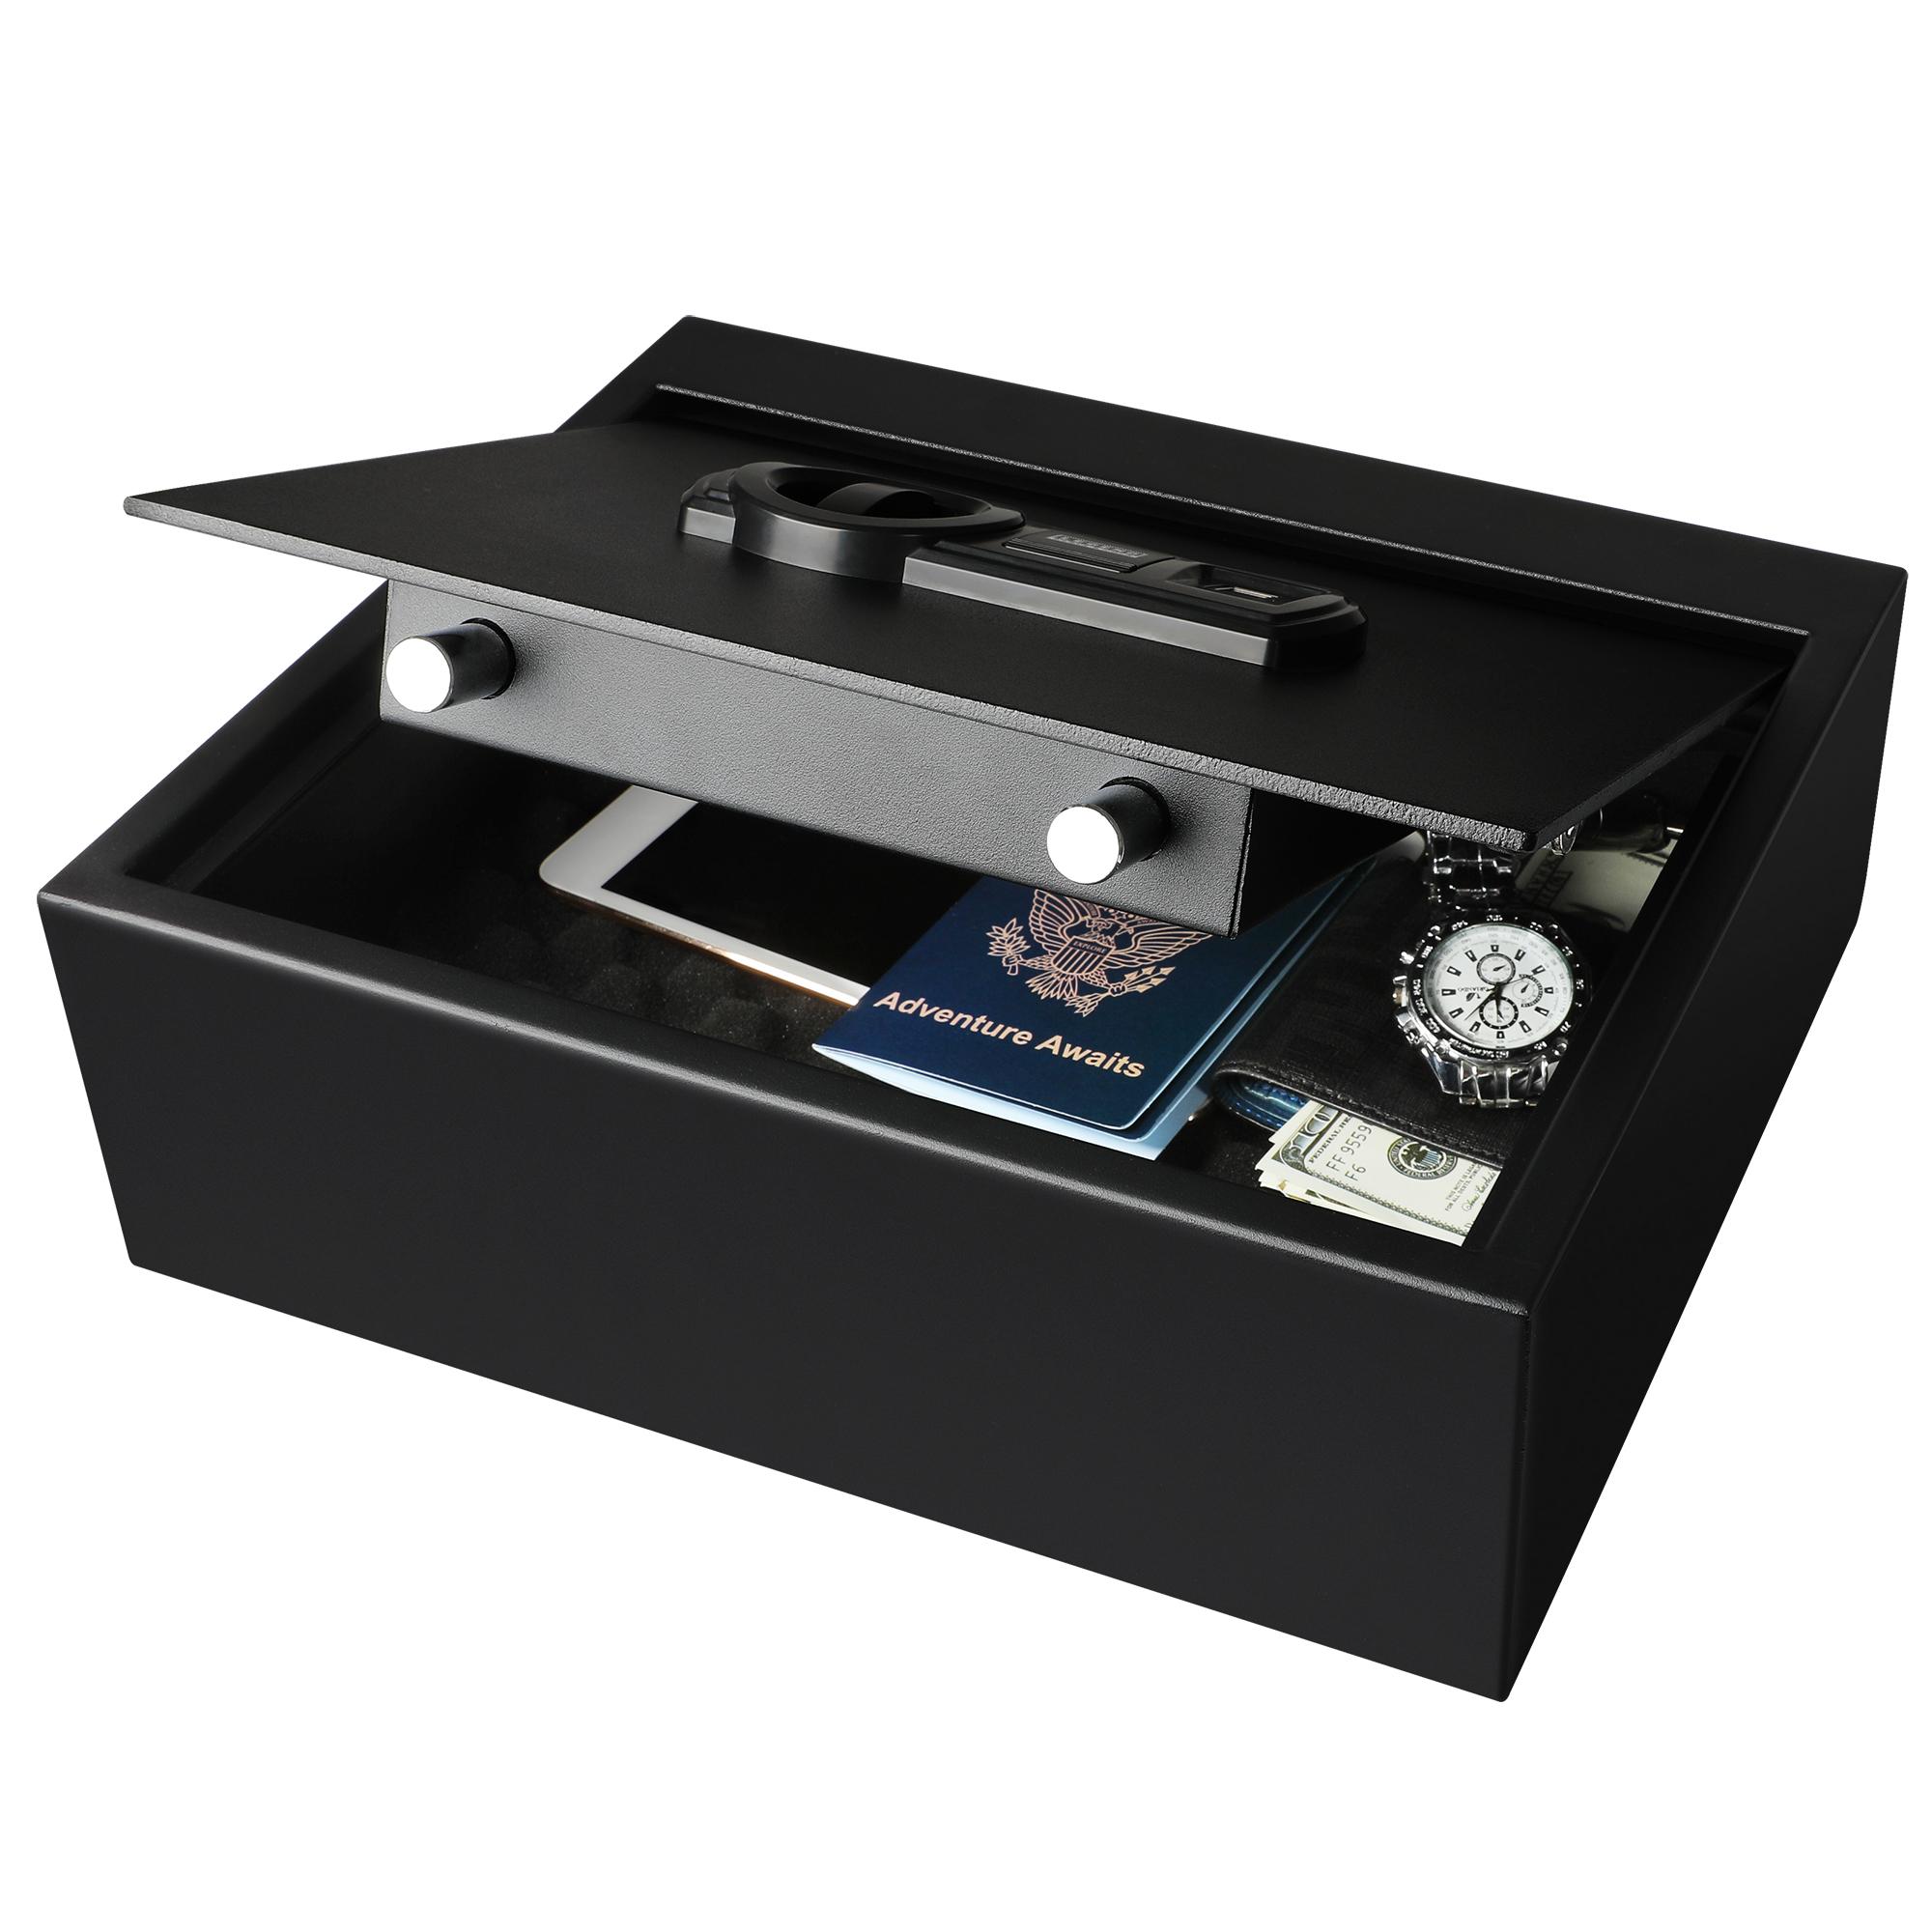 Legend Range & Field Biometric Personal Drawer Safe